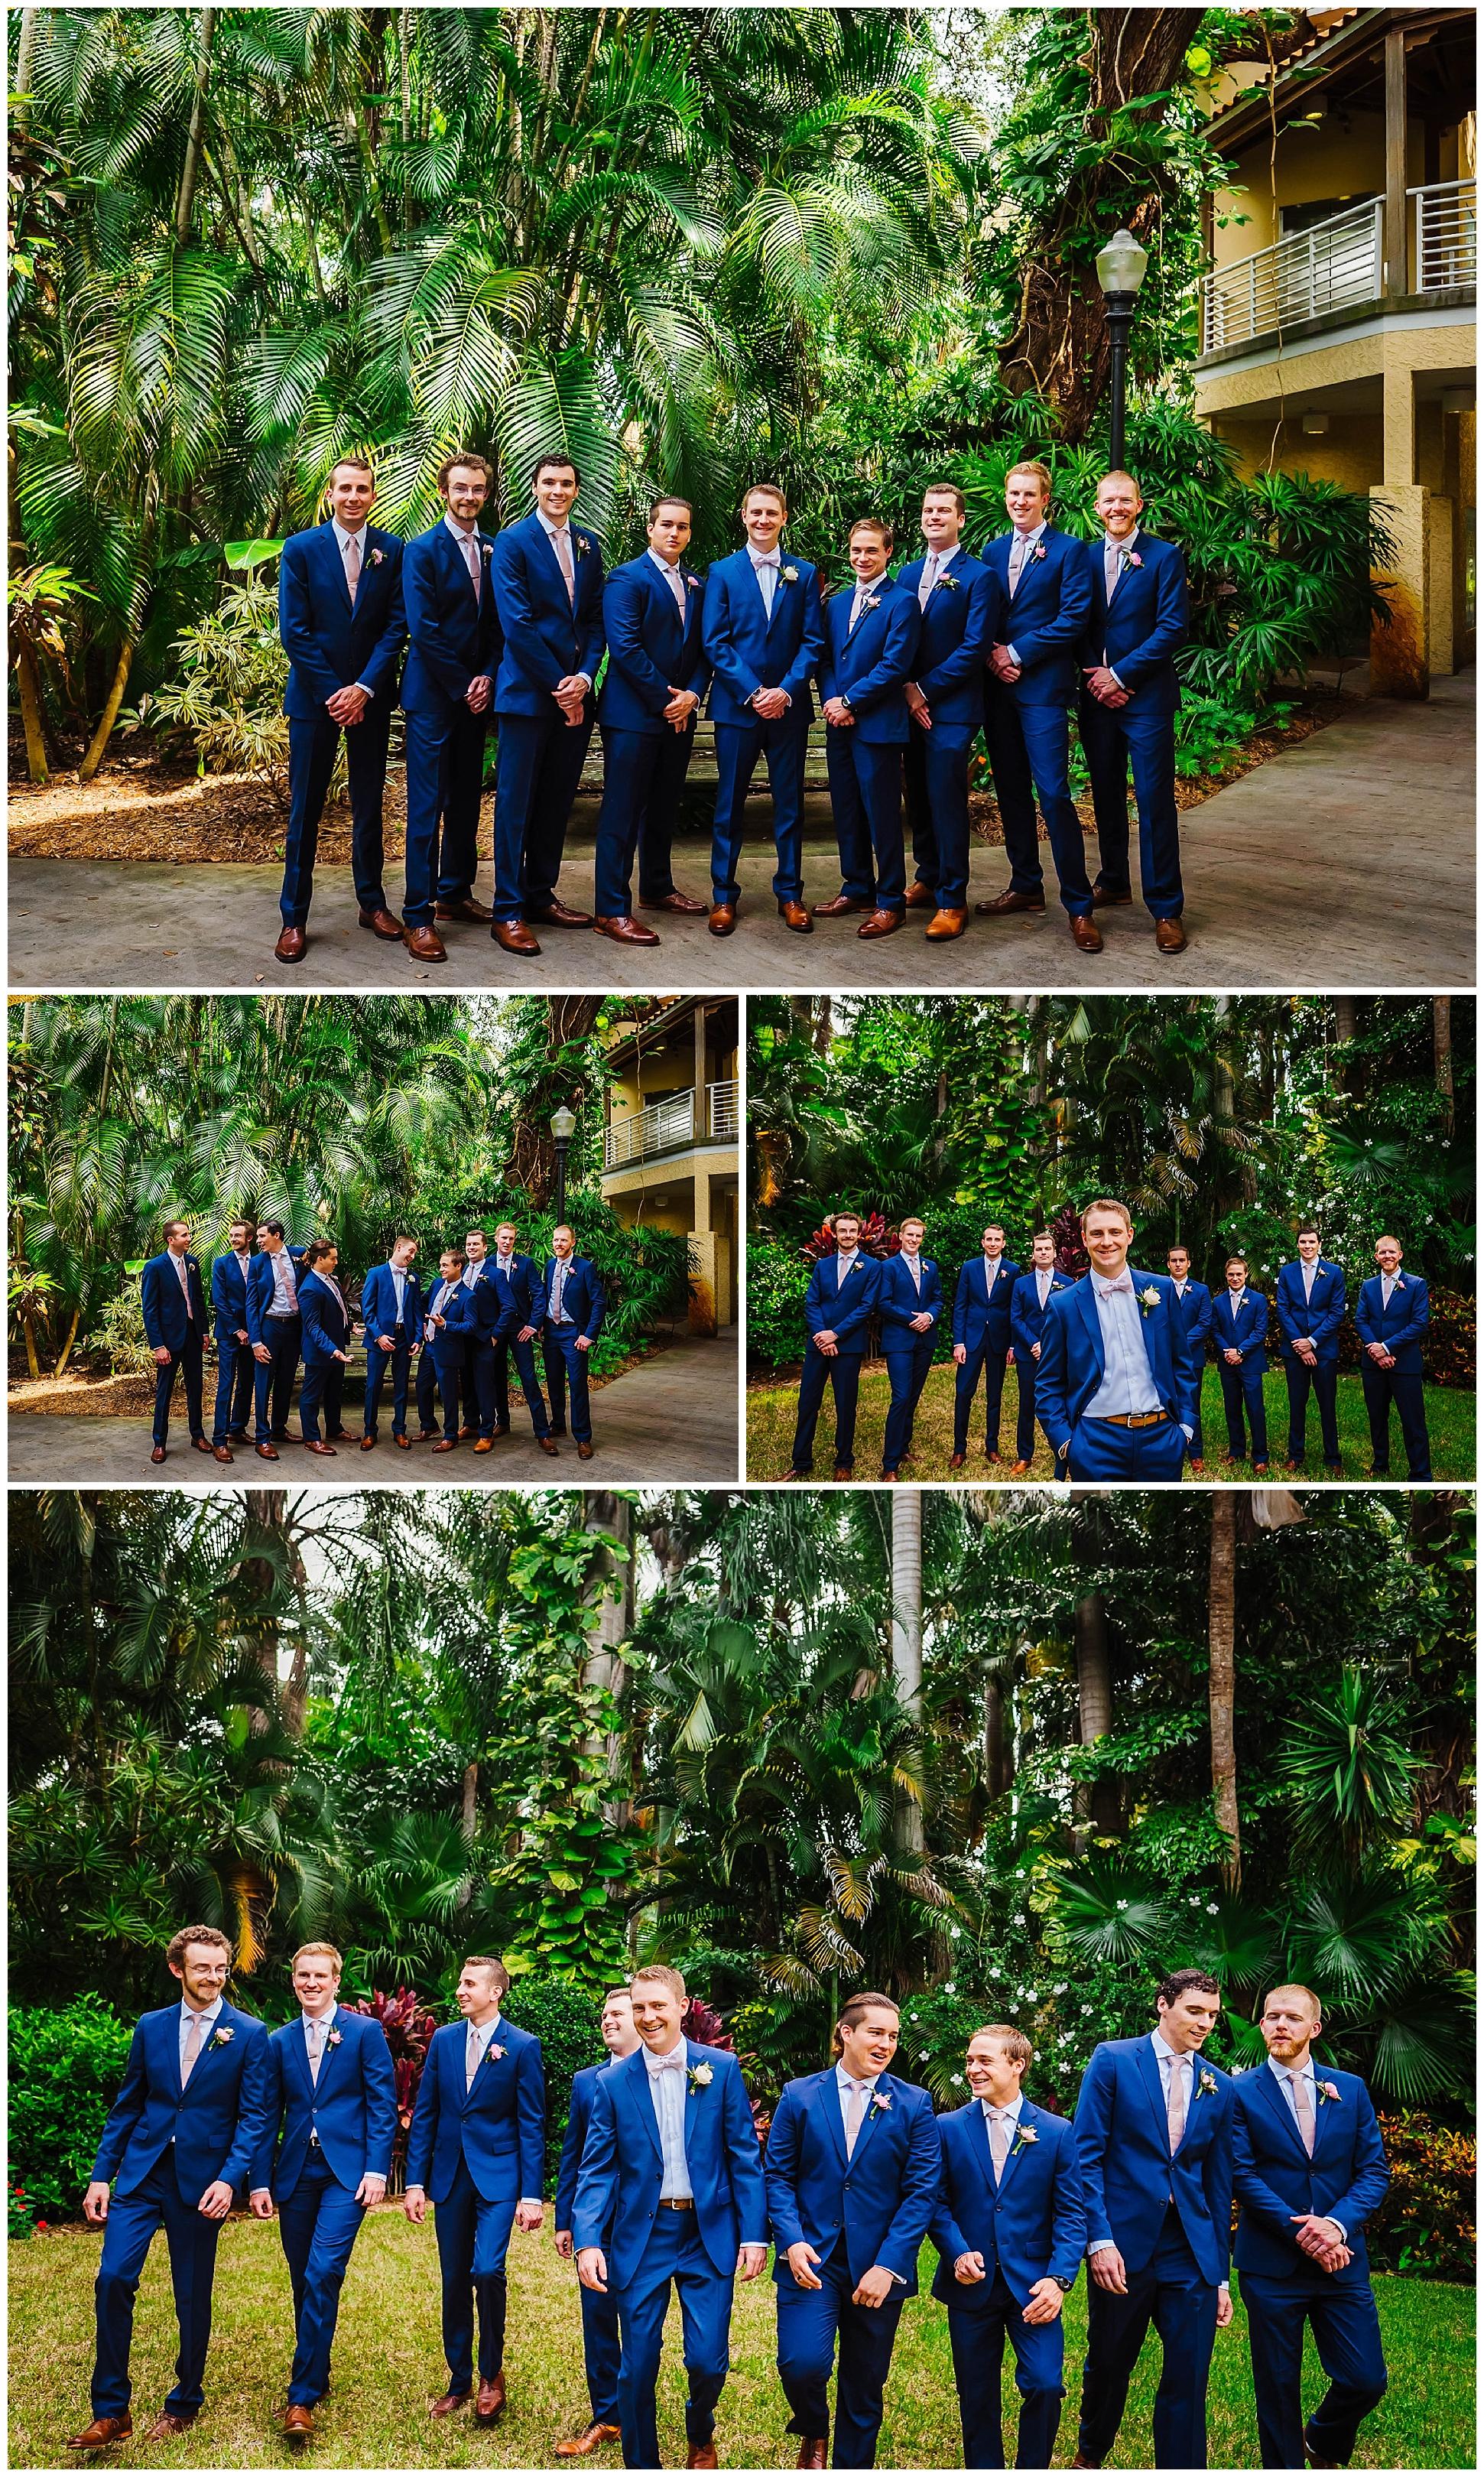 st-pete-wedding-photographer-sunken-gardens-crystal-ballroom-princess-dancer_0138.jpg